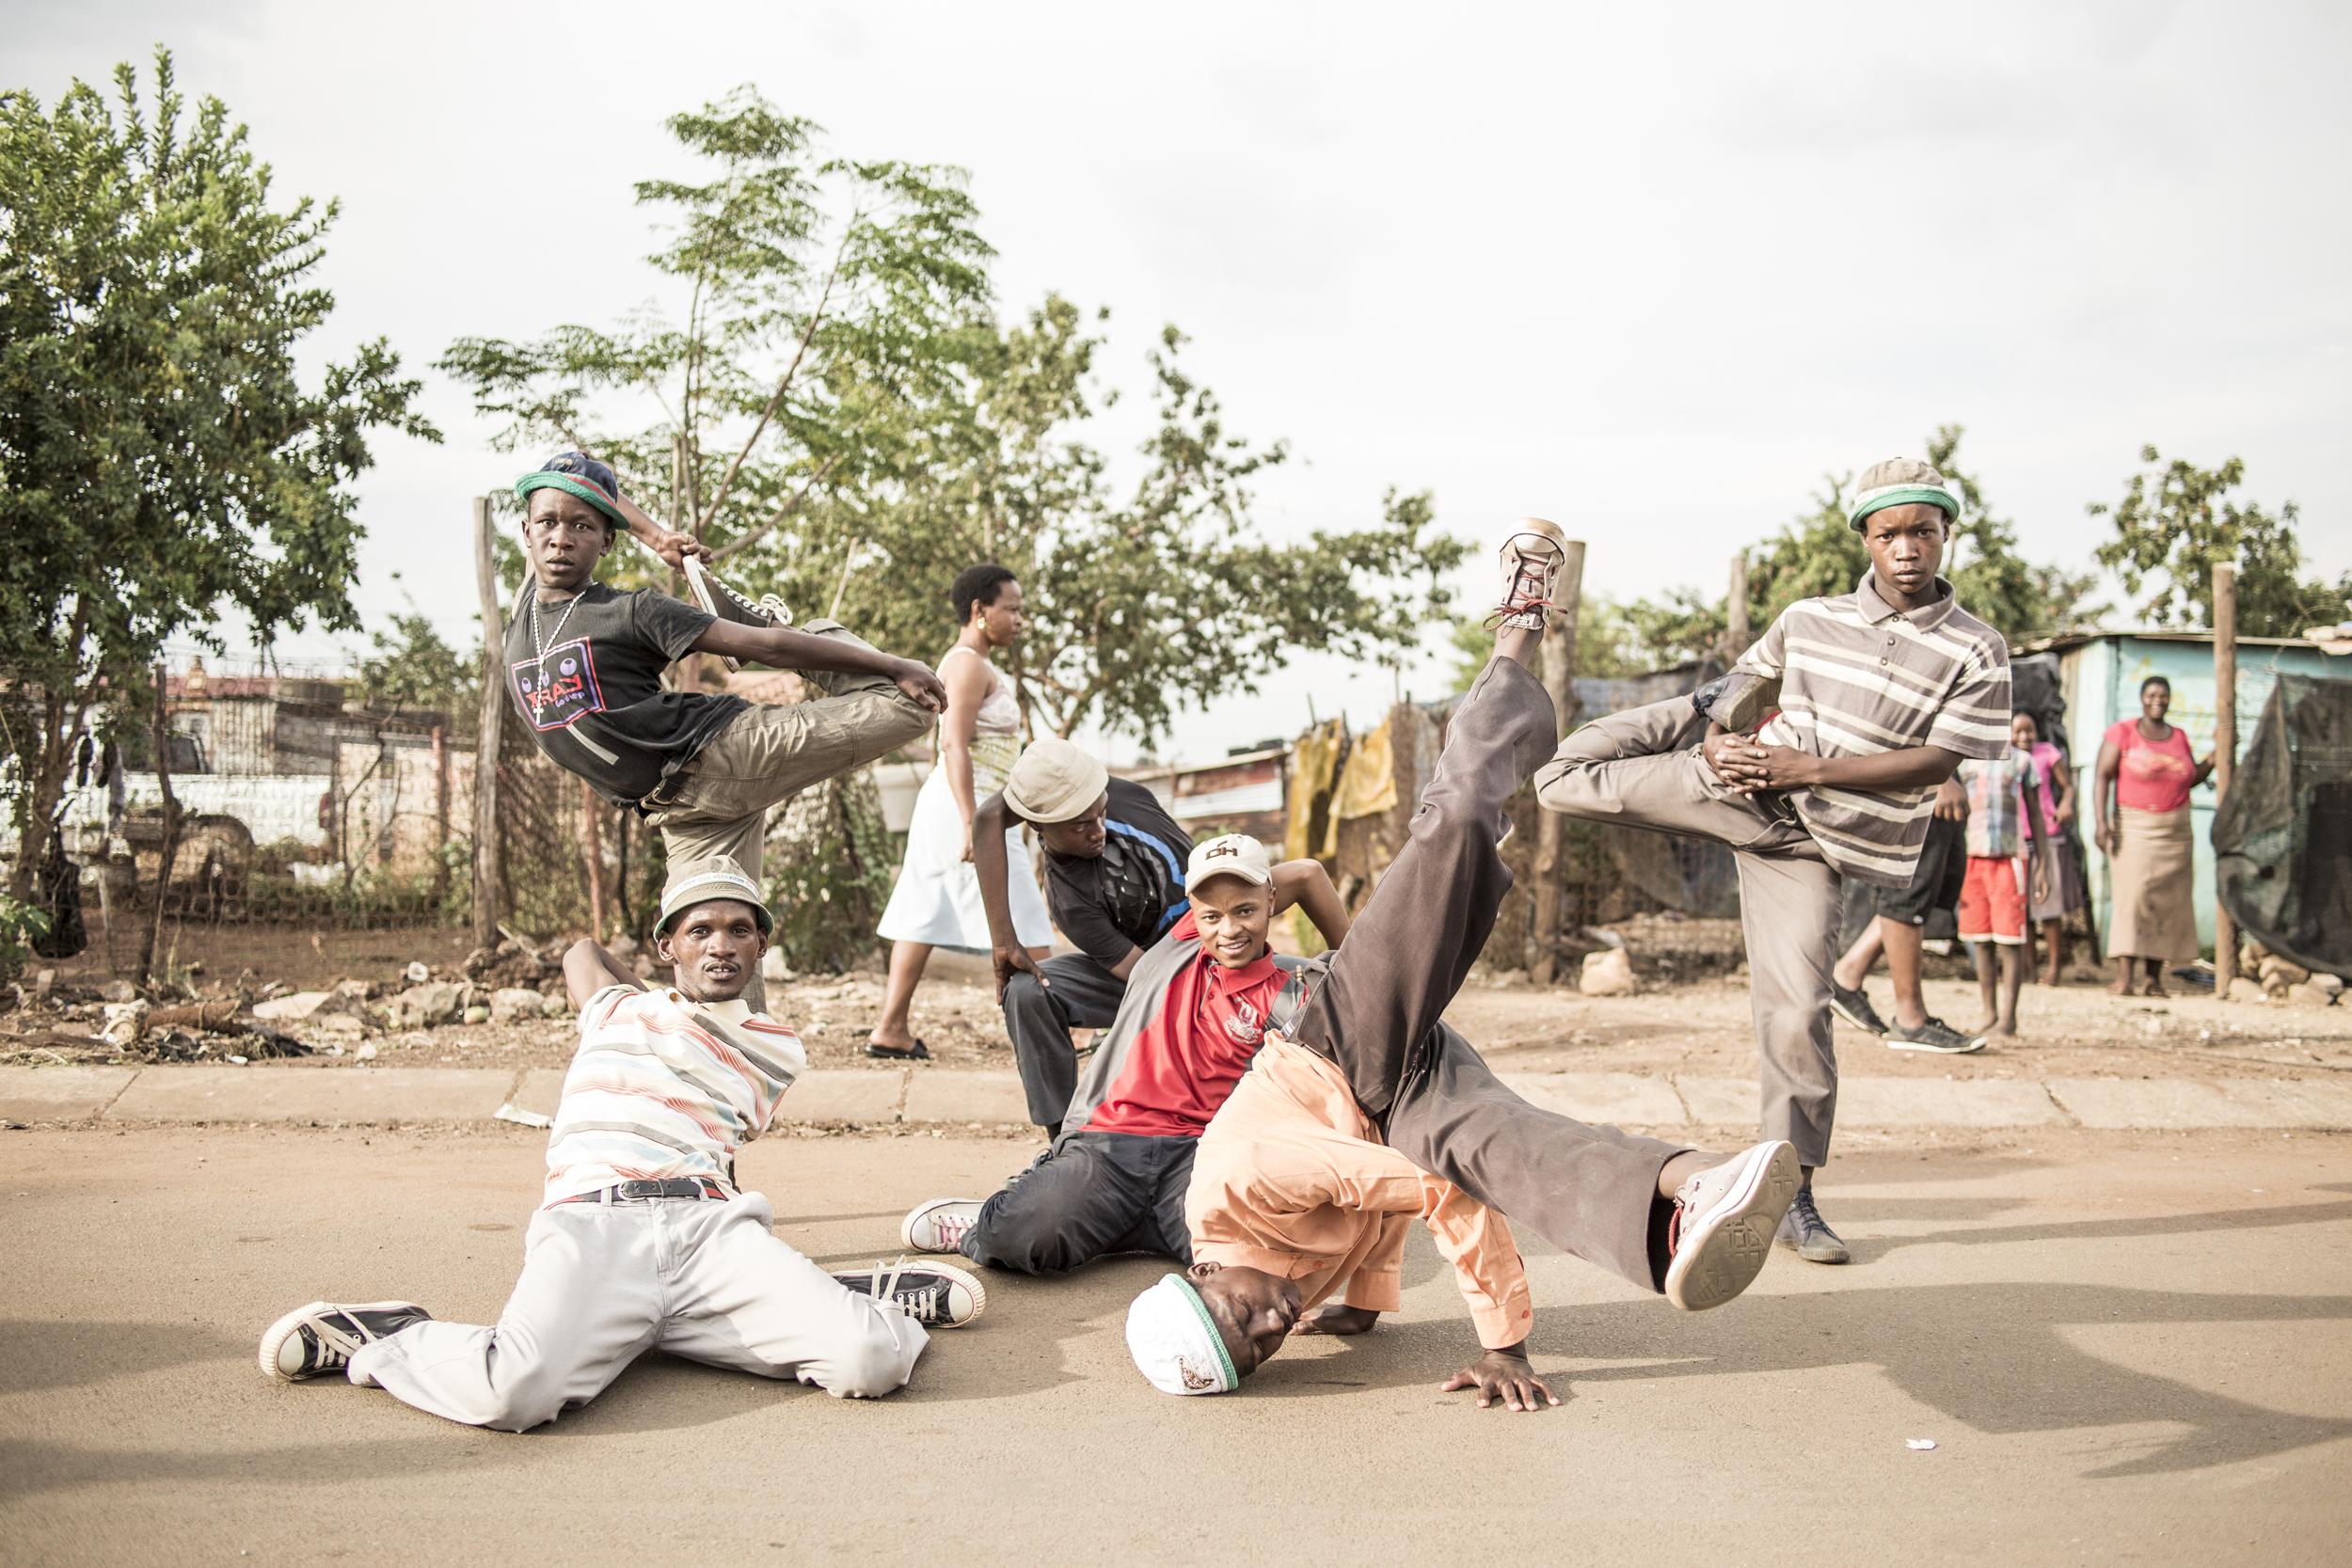 THE SKANDA DANCERS FROM SOWETO. CREDIT: CHRIS SAUNDERS